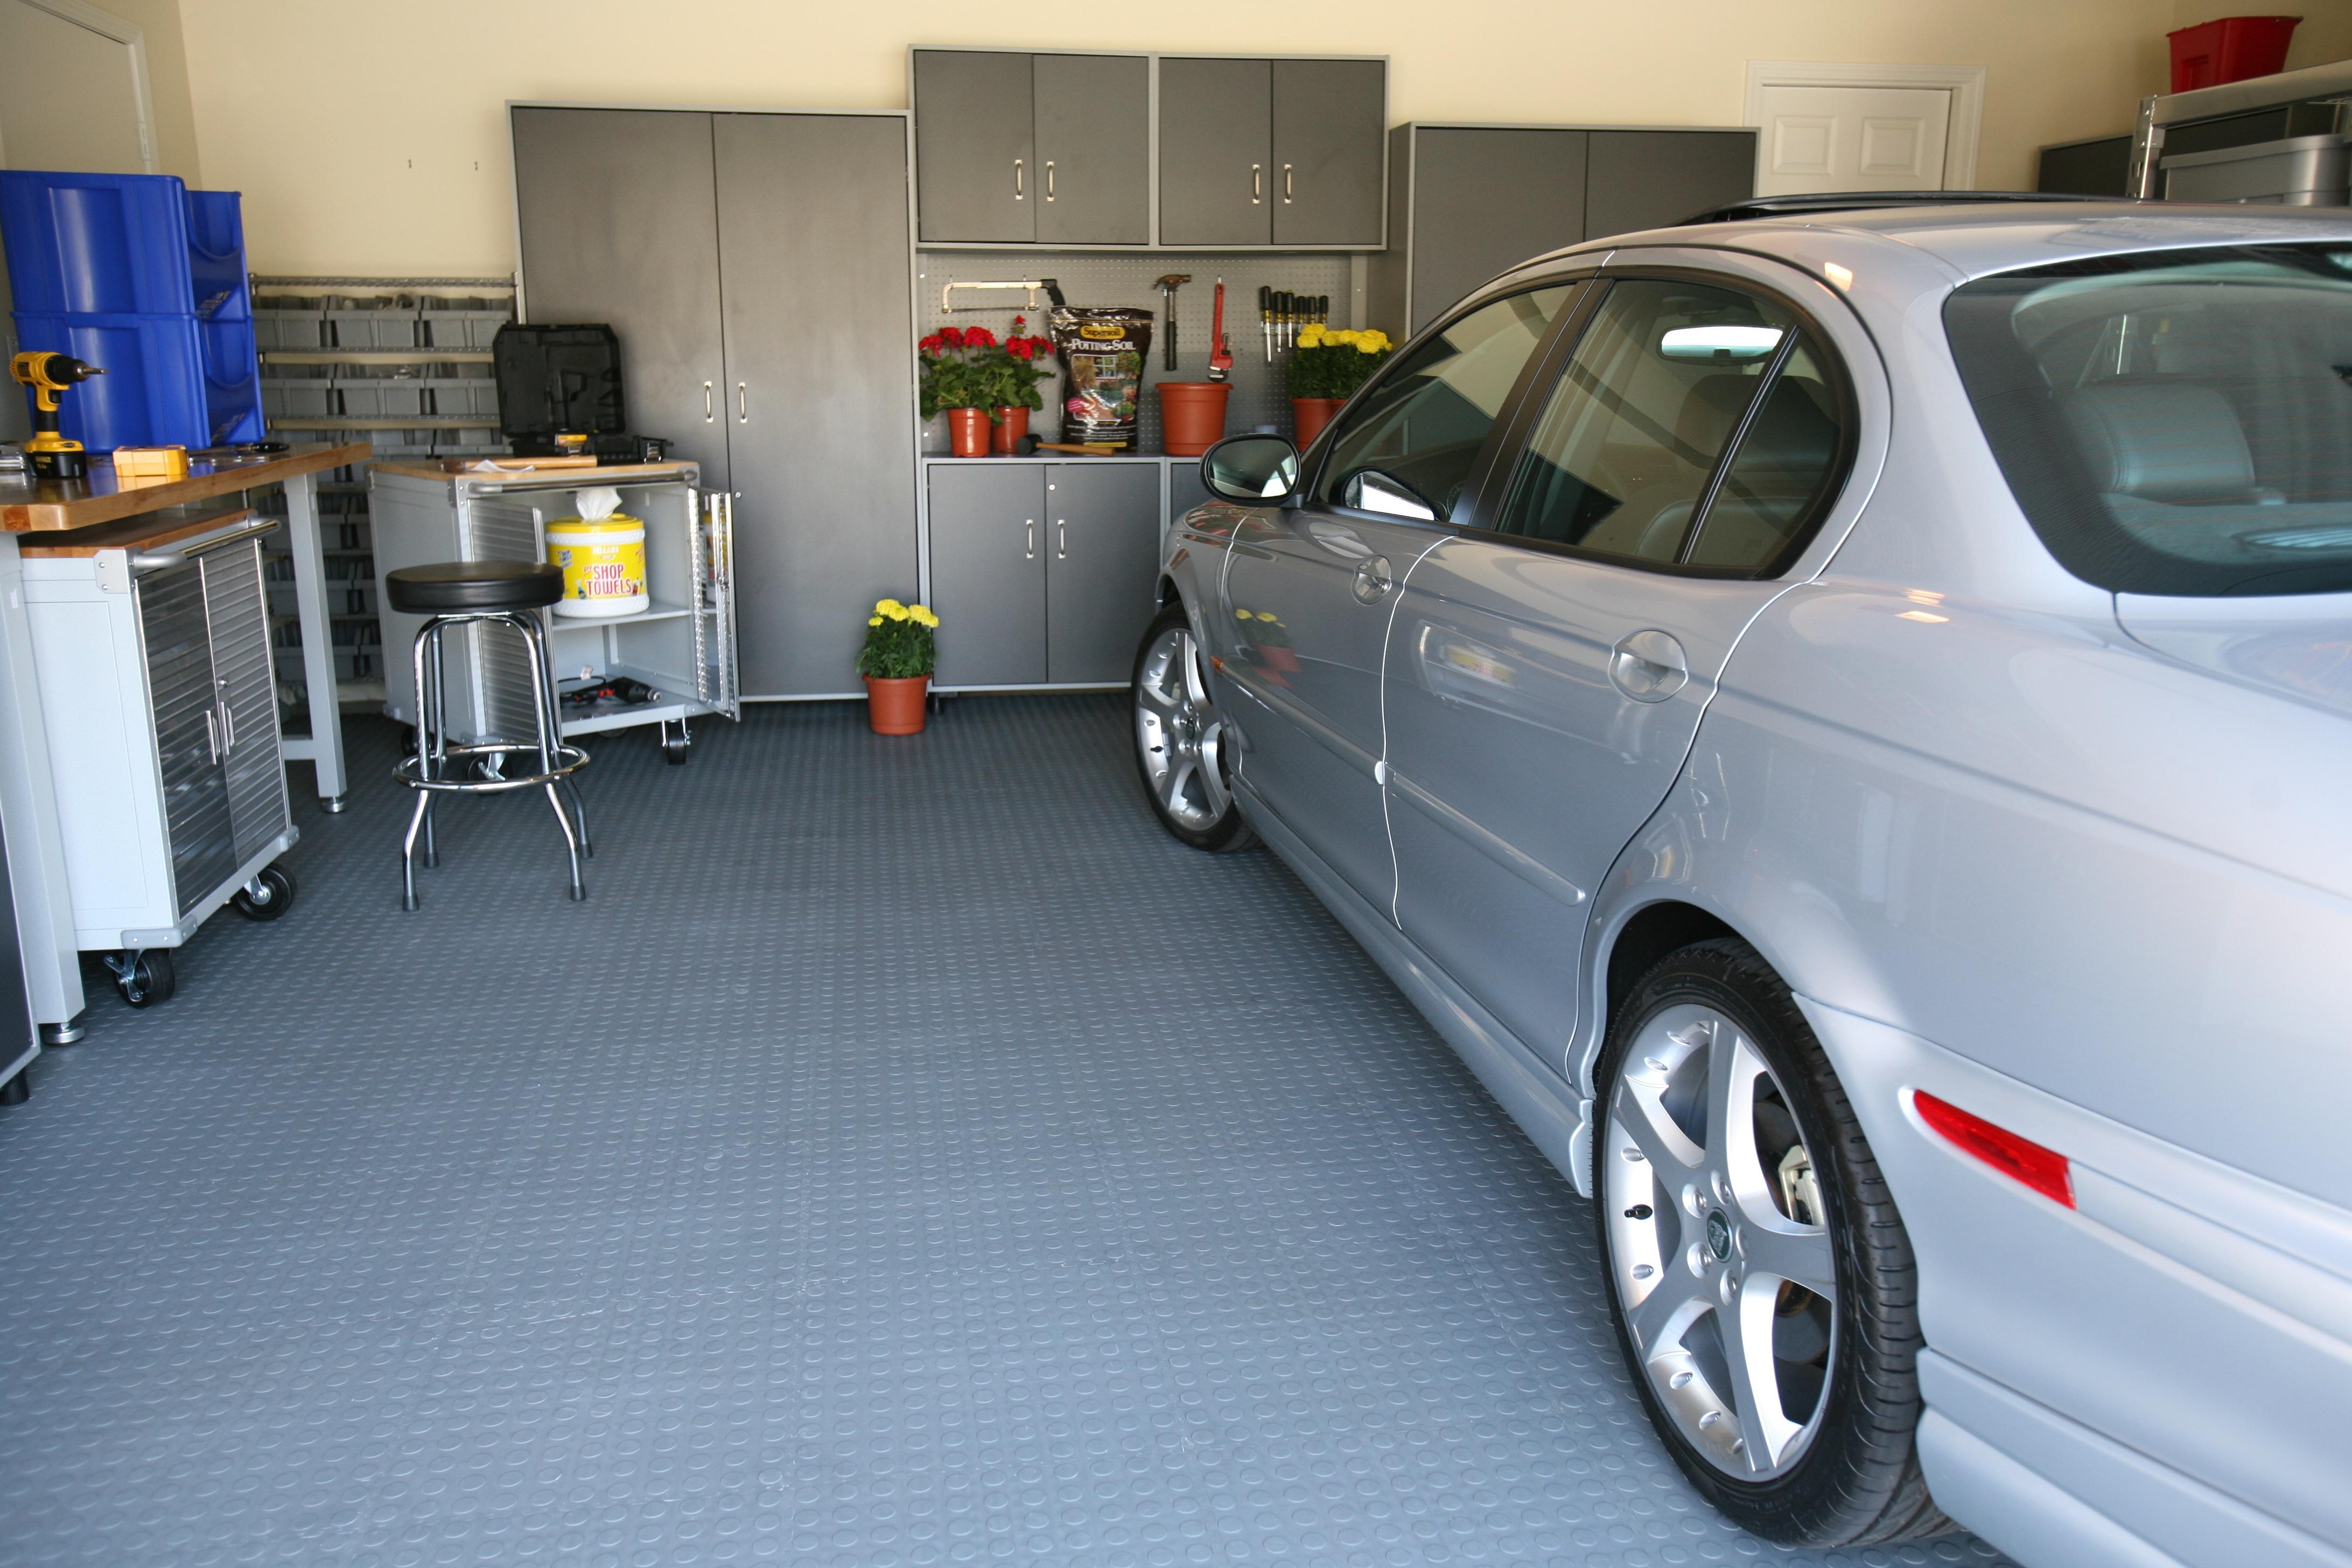 Garage Flooring Tiles : Racedeck diamond garage flooring shop flooring